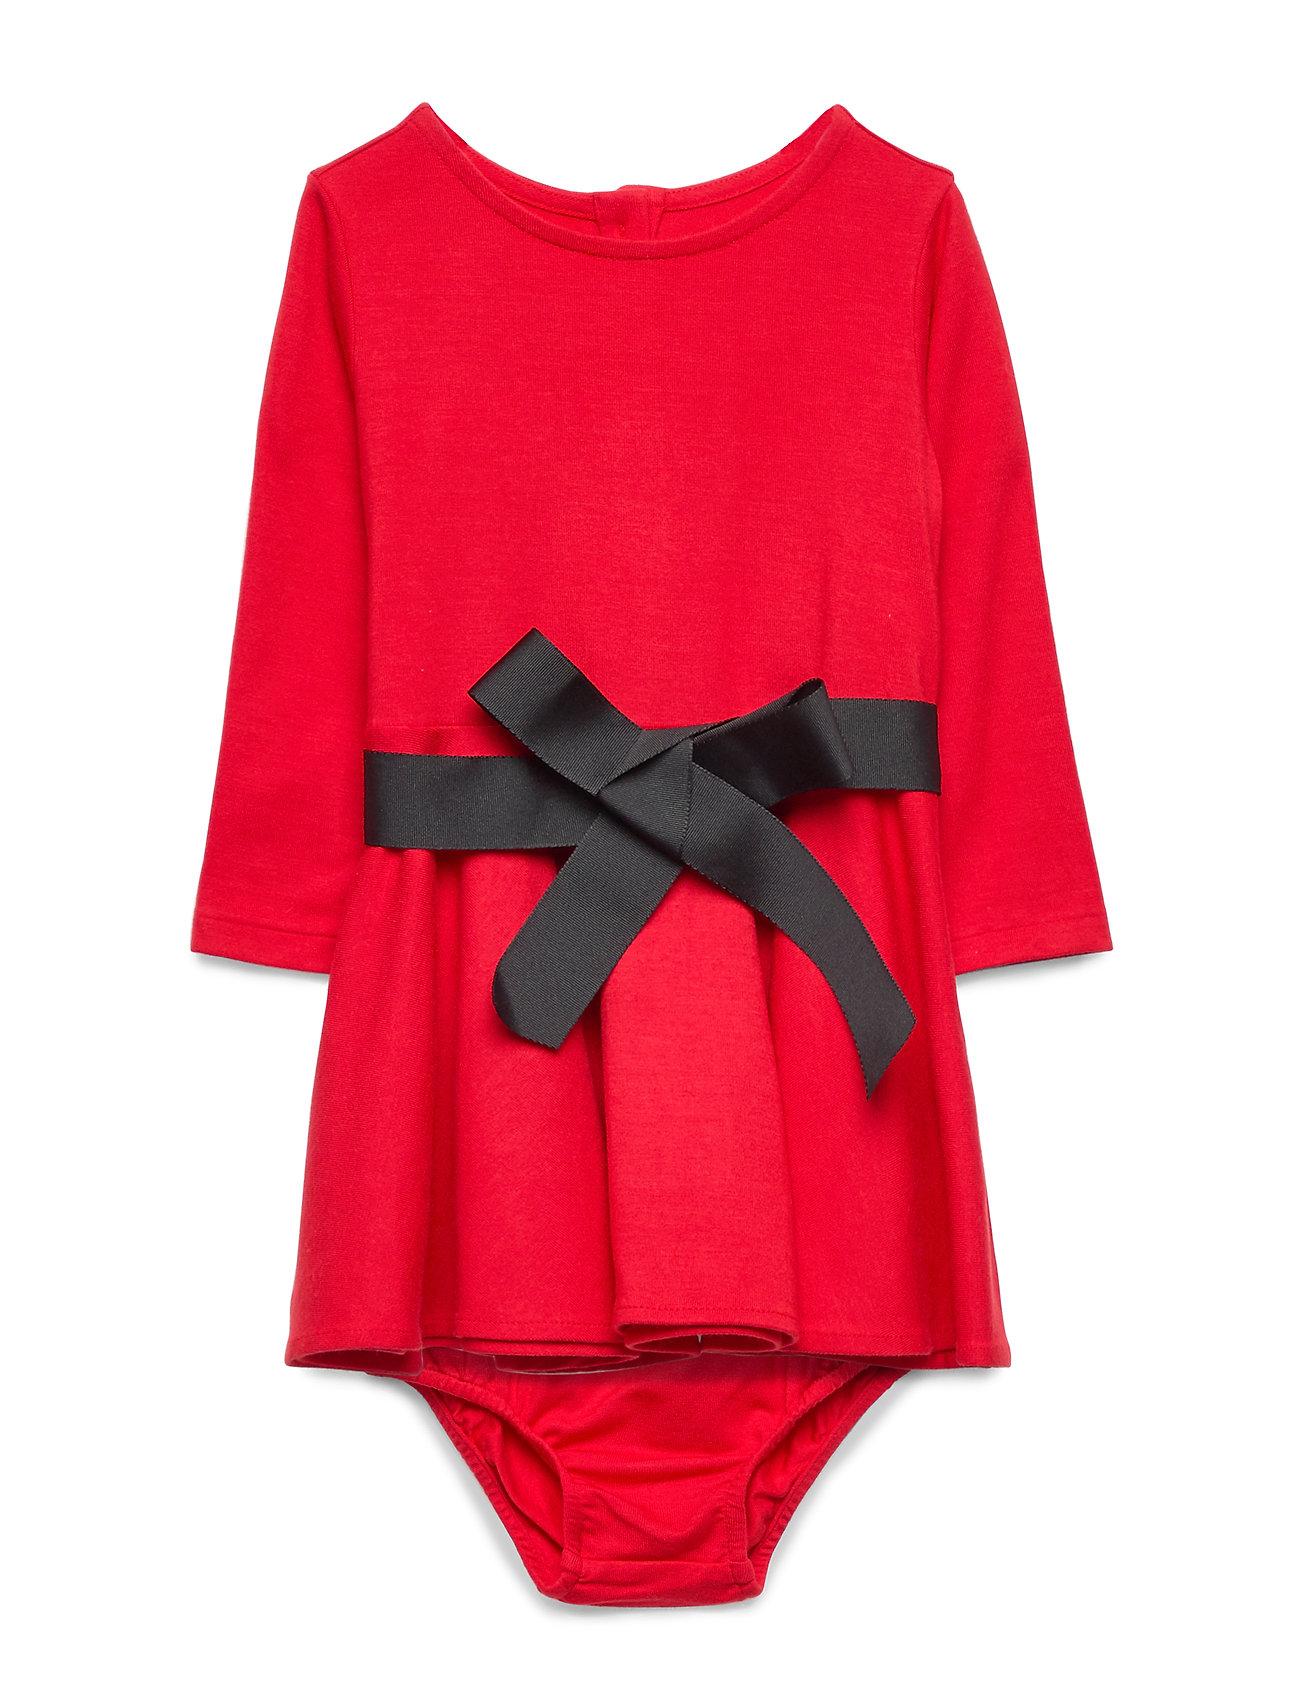 Ralph Lauren Baby KNIT JERSEY-DRESSES-KNIT - RL 2000 RED